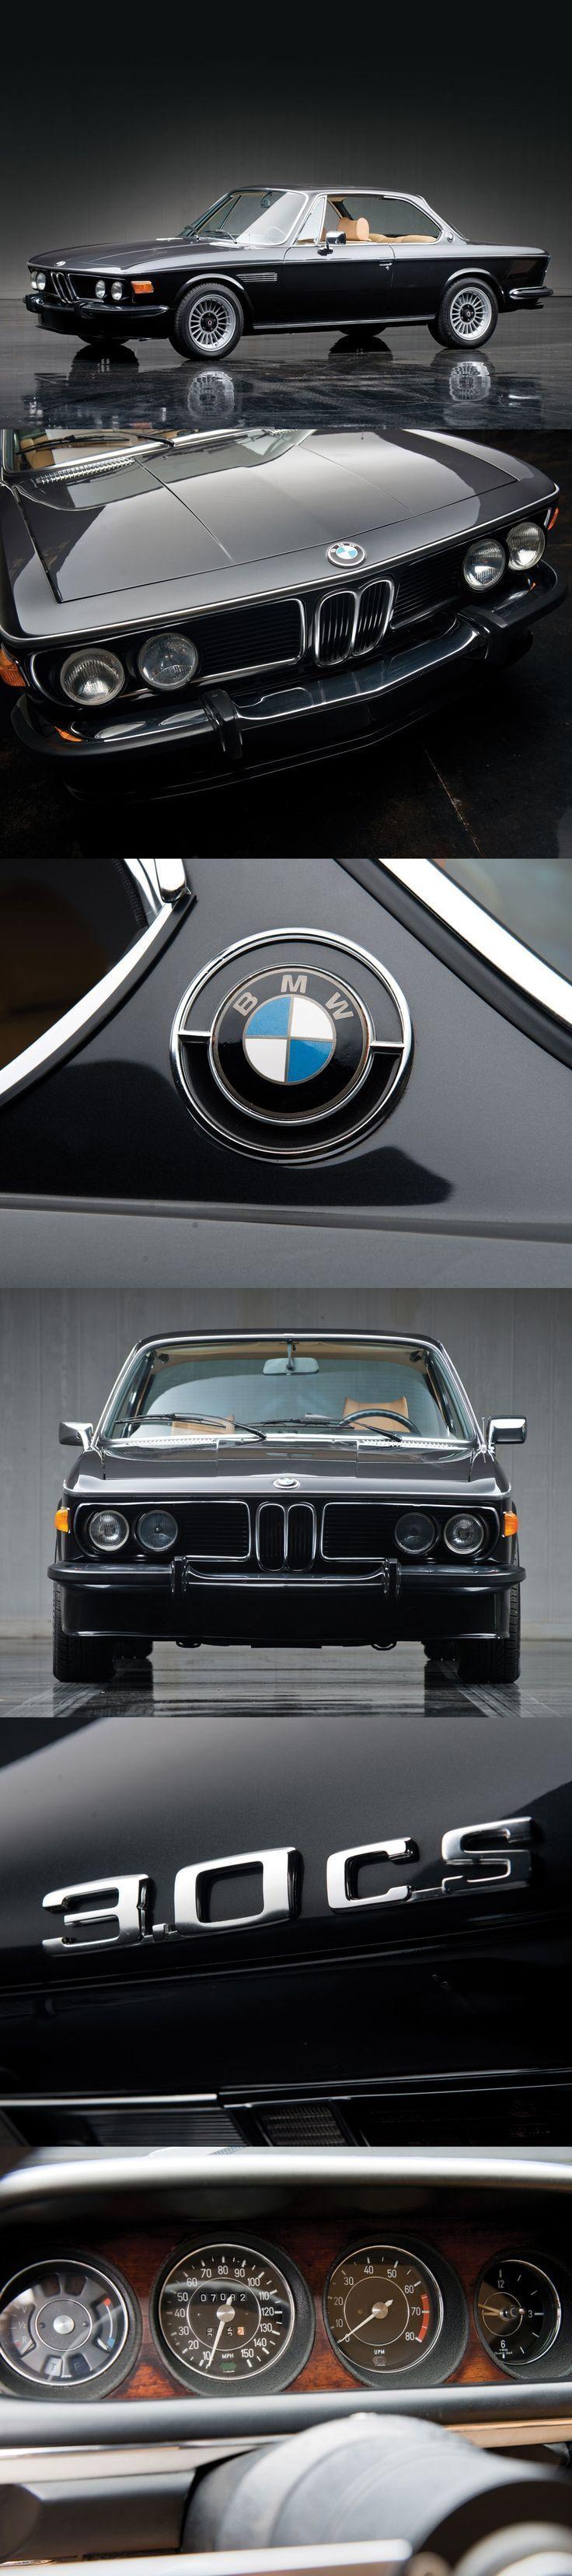 1974 BMW 3.0 CS // Gugli917 Follow my work and inspiration Pinterest : http://www.pinterest.com/gugli917/ Facebook : https://www.facebook.com/gugli917 Twitter : https://twitter.com/Gugli917 Instagram : http://instagram.com/gugli917 Tumblr : http://gugli917.tumblr.com: